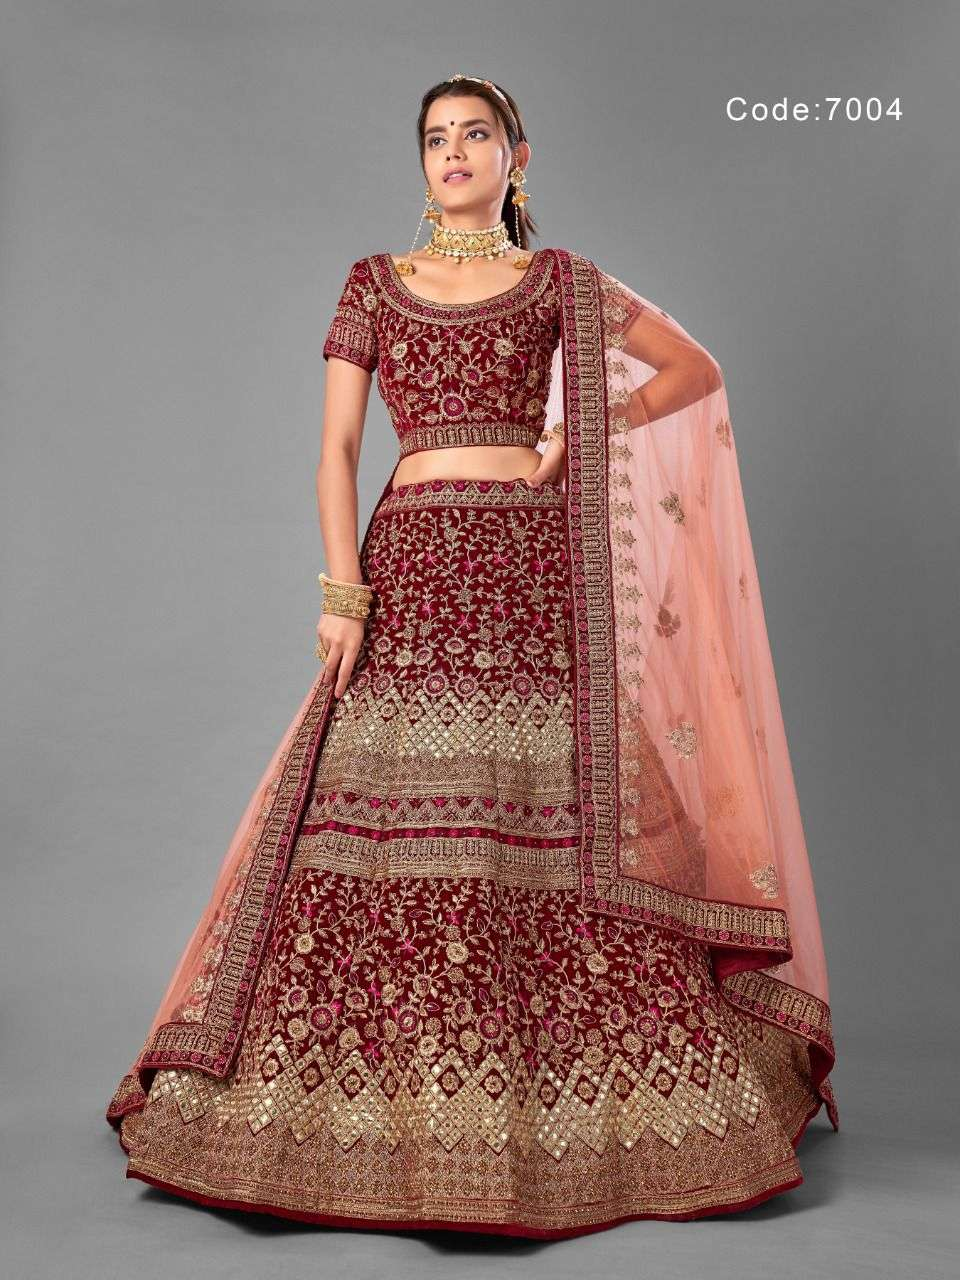 Arya 7001-7012 Series Vol 18 Wedding Bridal Velvet Lehenga